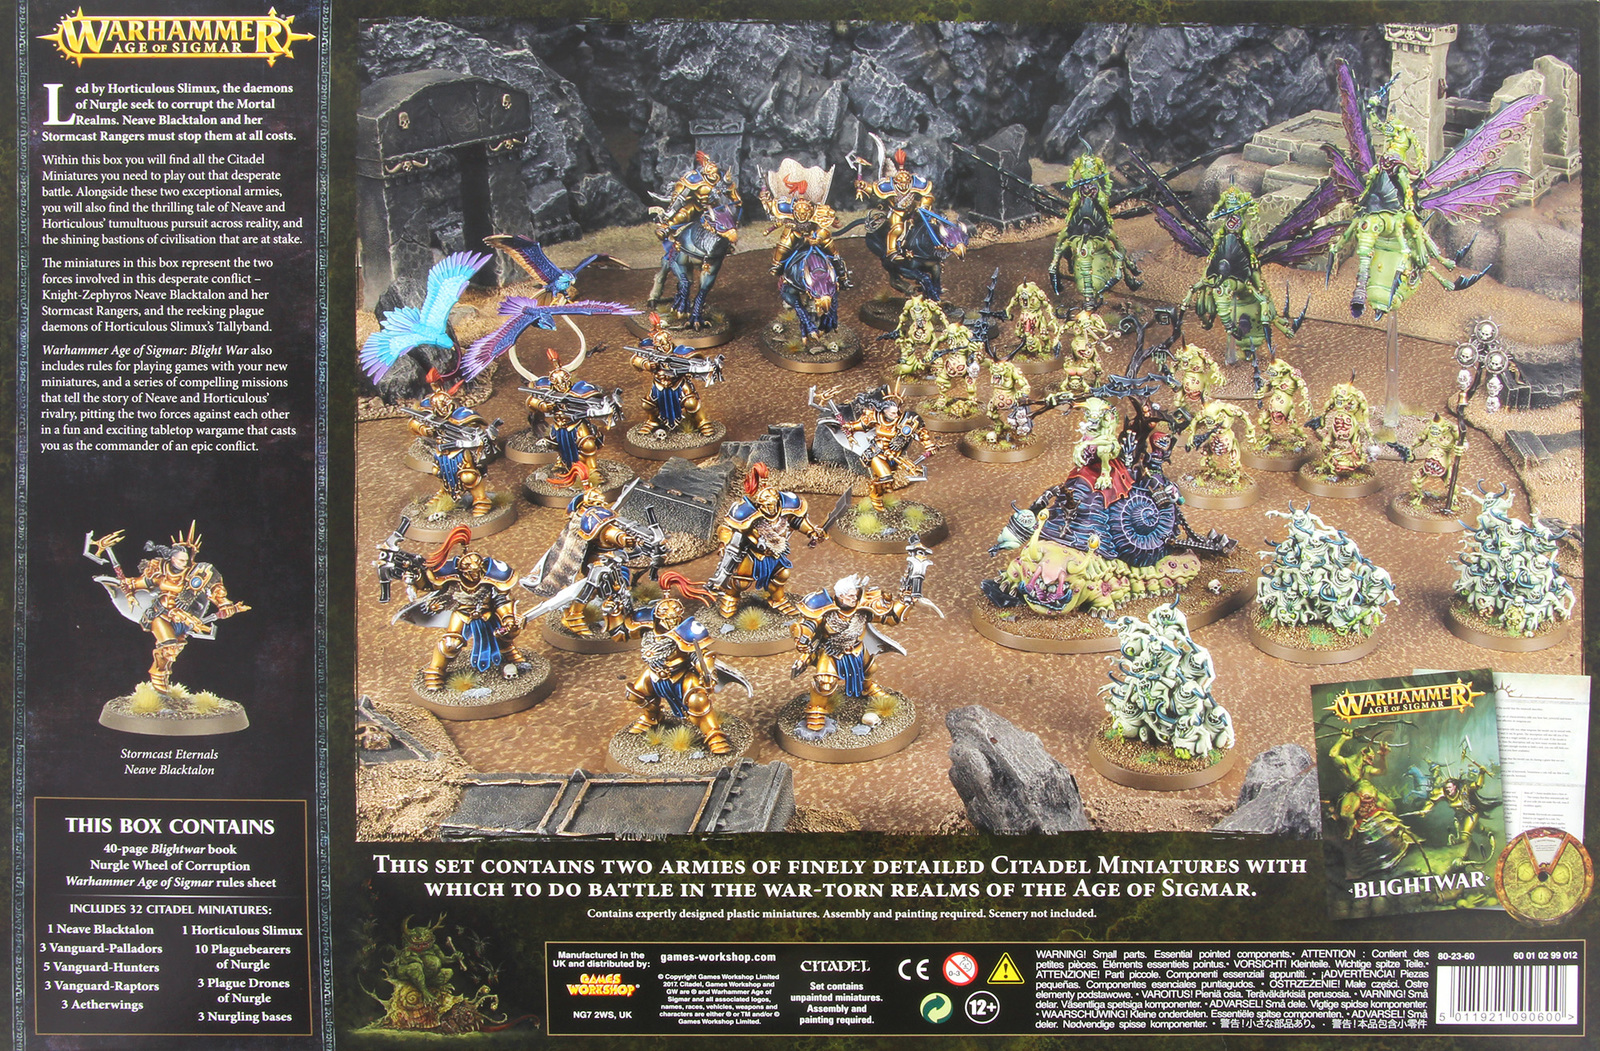 Warhammer Age of Sigmar: Blightwar image